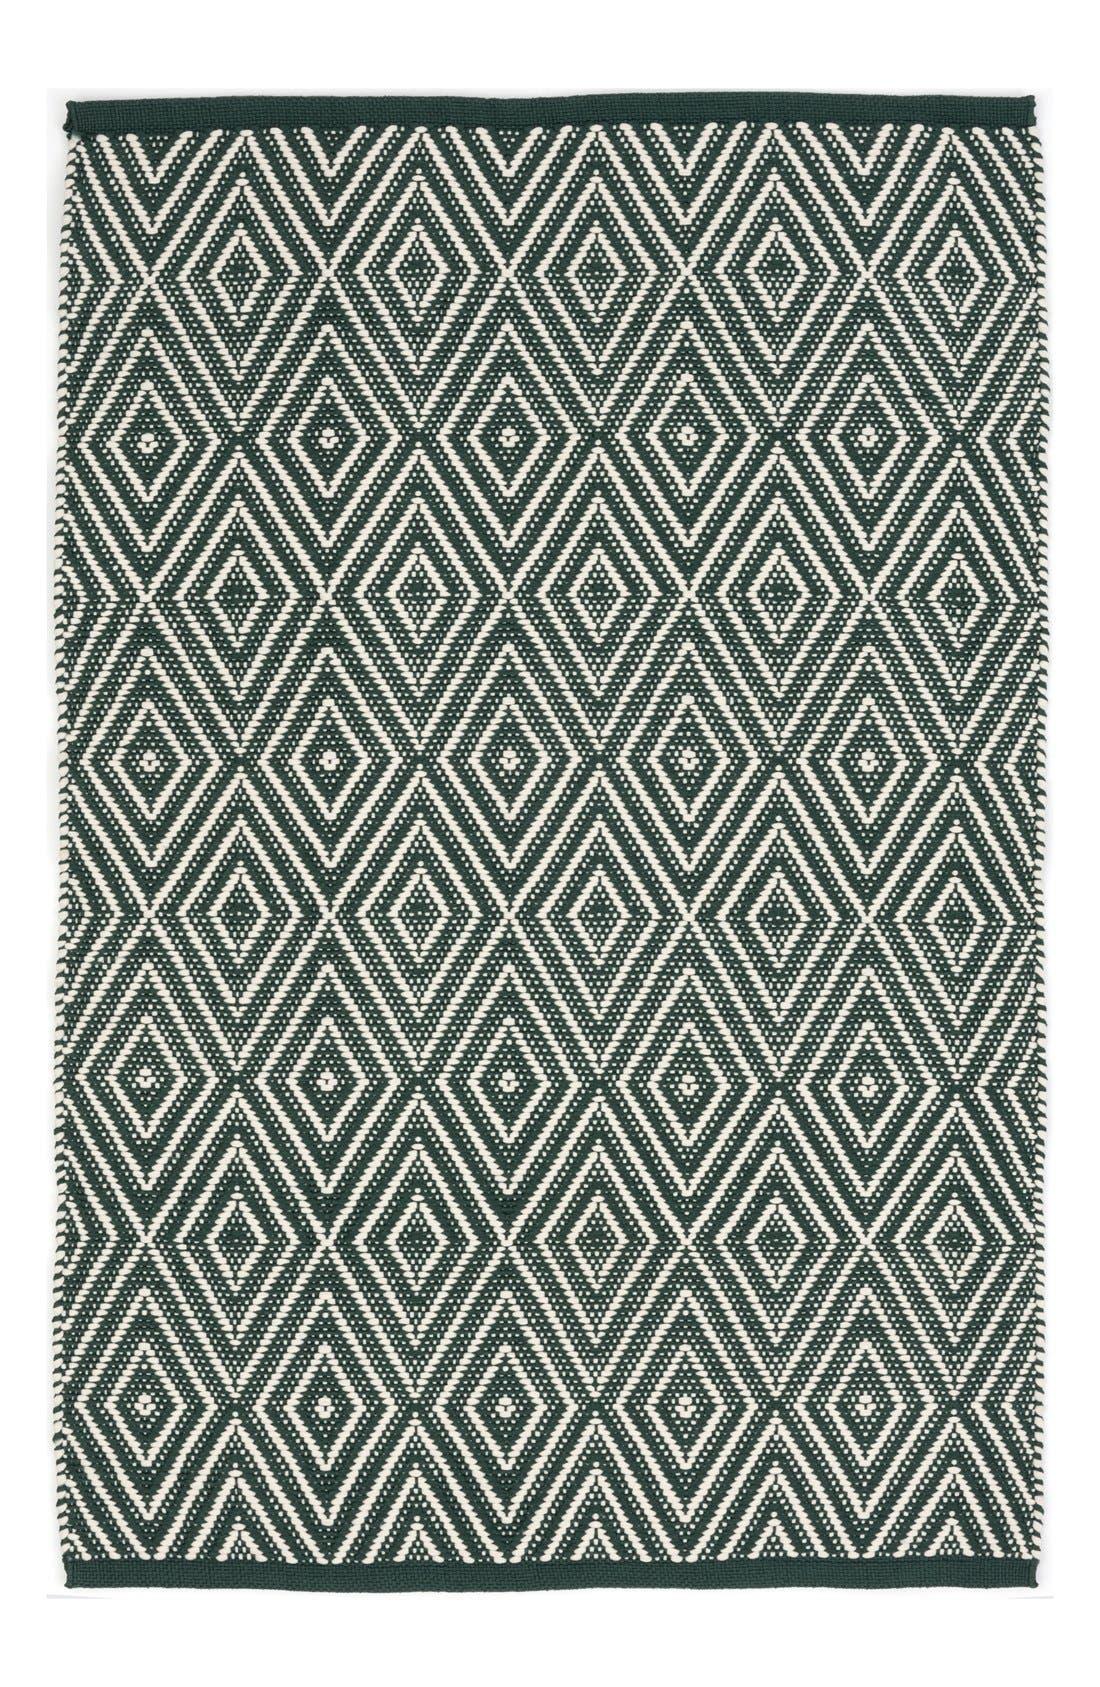 Main Image - Dash & Albert Diamond Print Rug